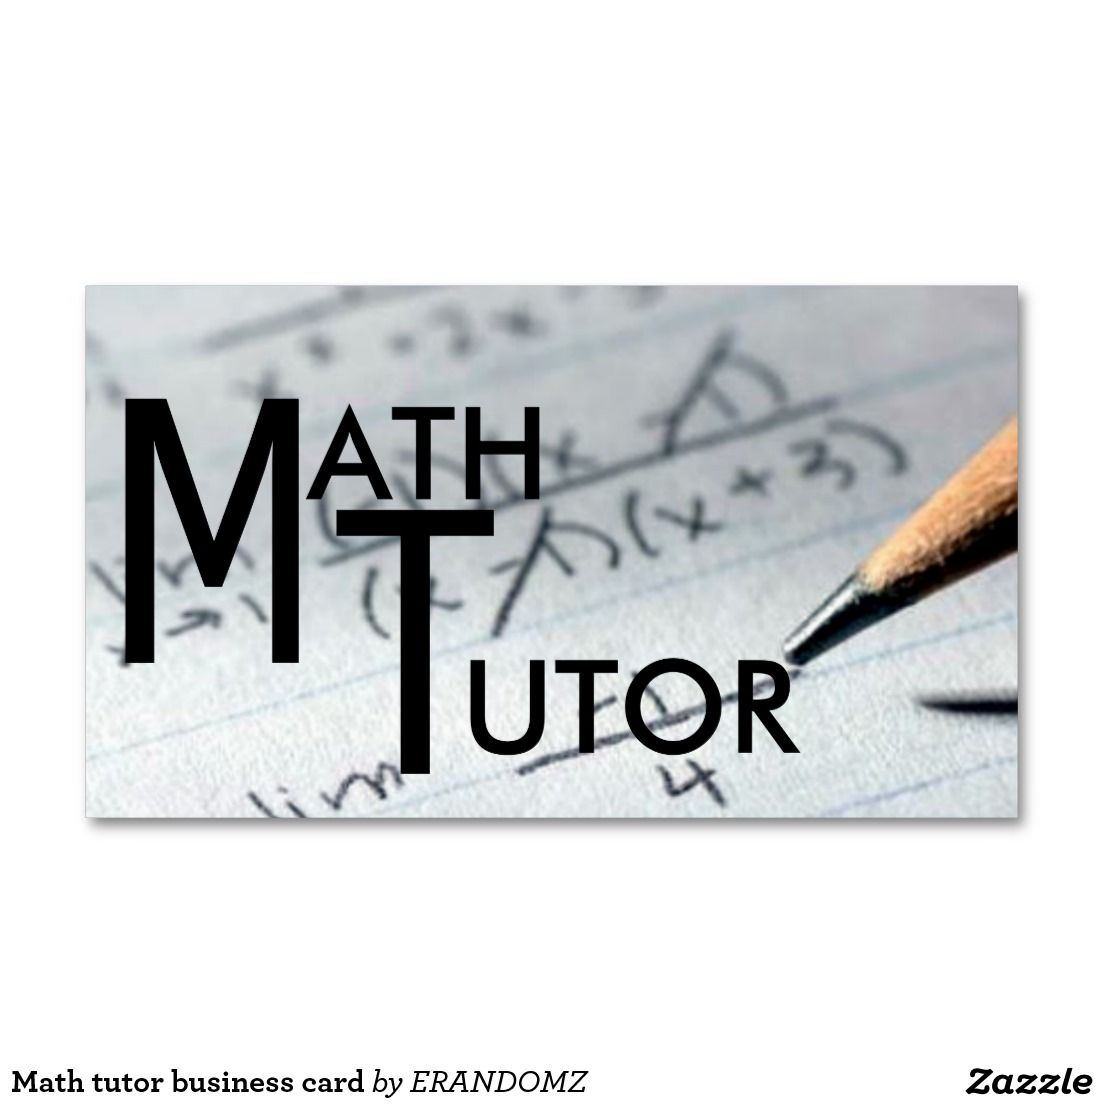 Math tutor business card | Math tutor, Business cards and Math